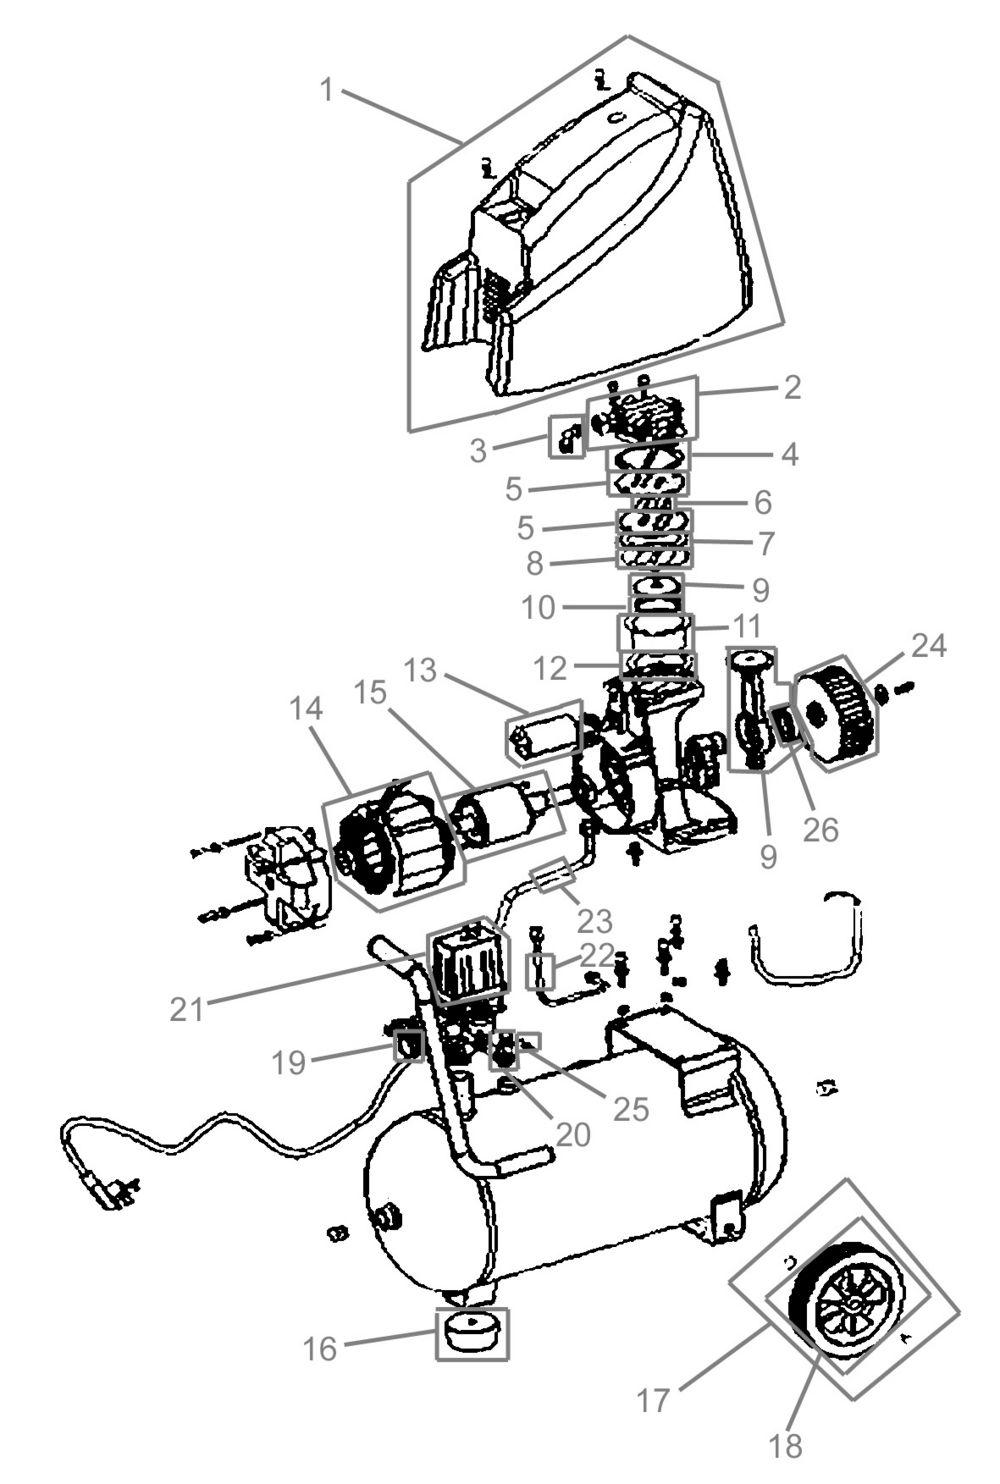 g de kompressor 210 8 24 ersatzteile industriewerkzeuge ausr stung. Black Bedroom Furniture Sets. Home Design Ideas